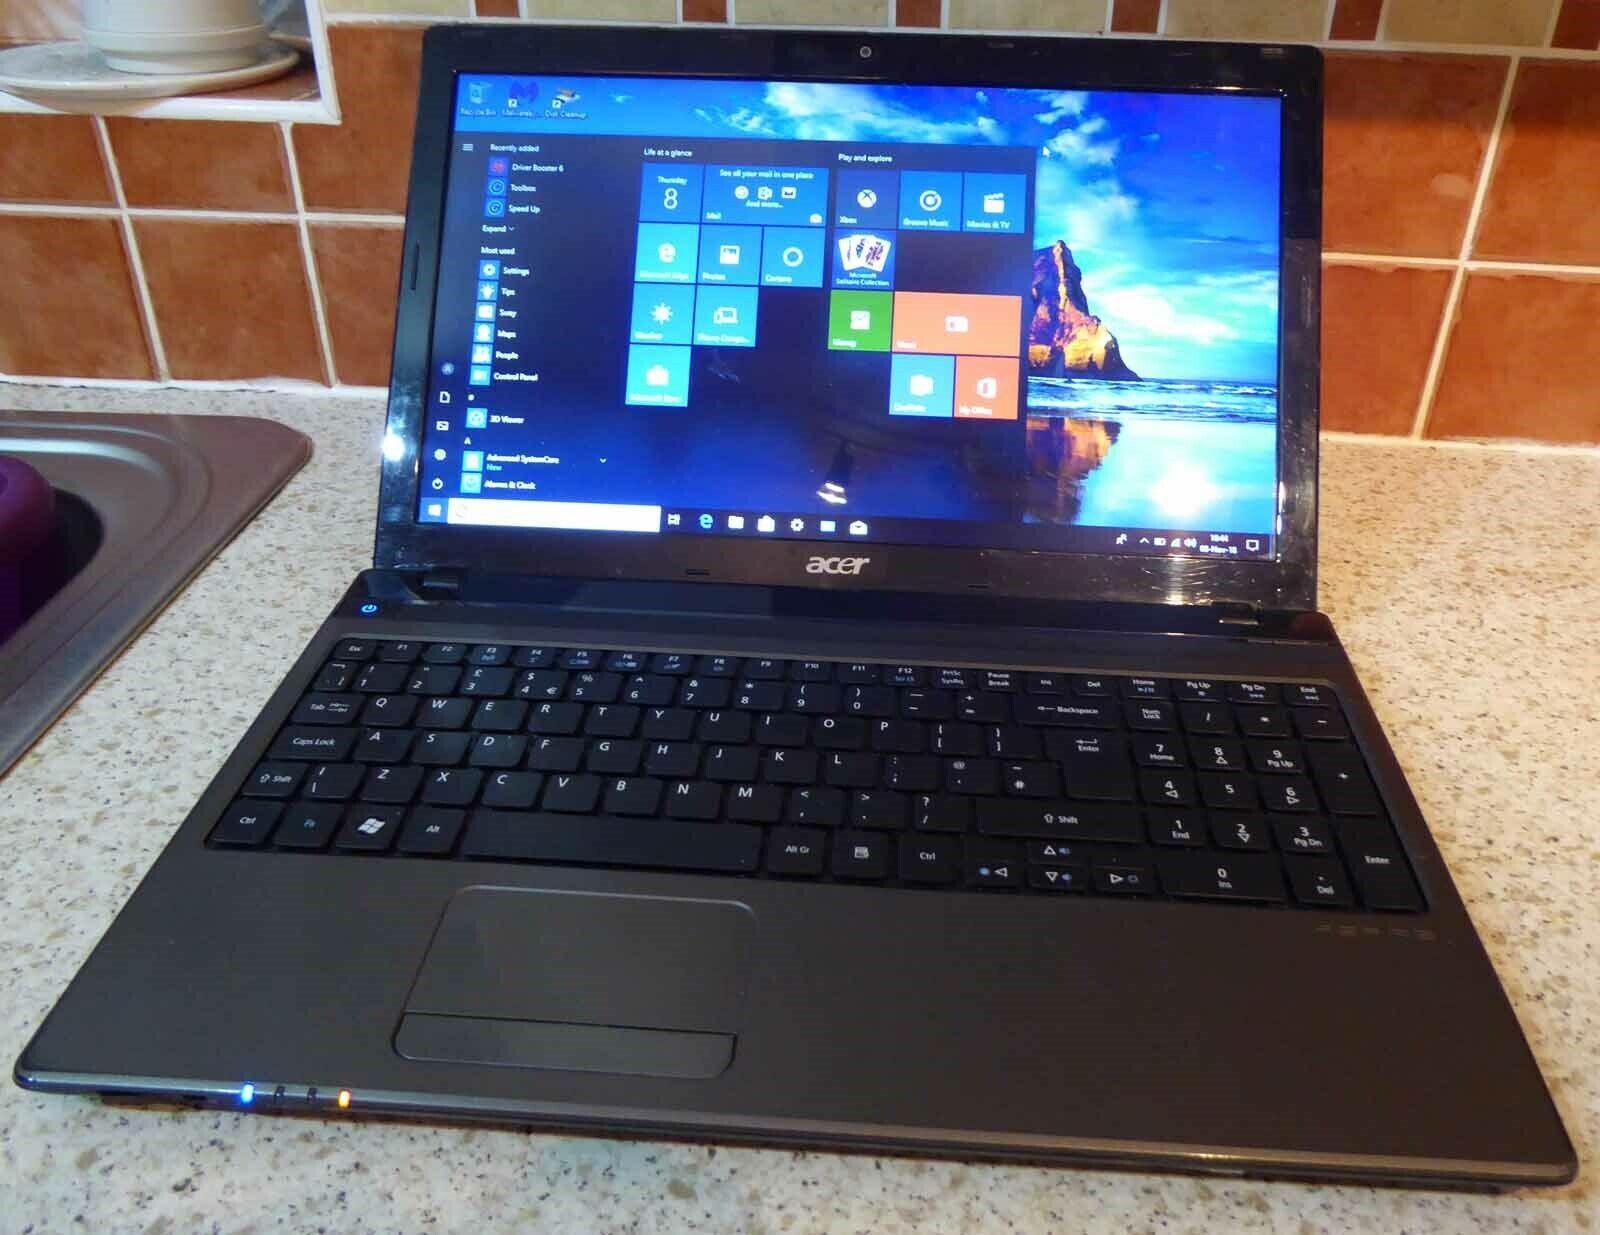 Laptop Windows - ACER ASPIRE 5750 LAPTOP 2.4 GHZ INTEL CORE i5 WITH TURBOBOOST-WINDOWS 10- DVD